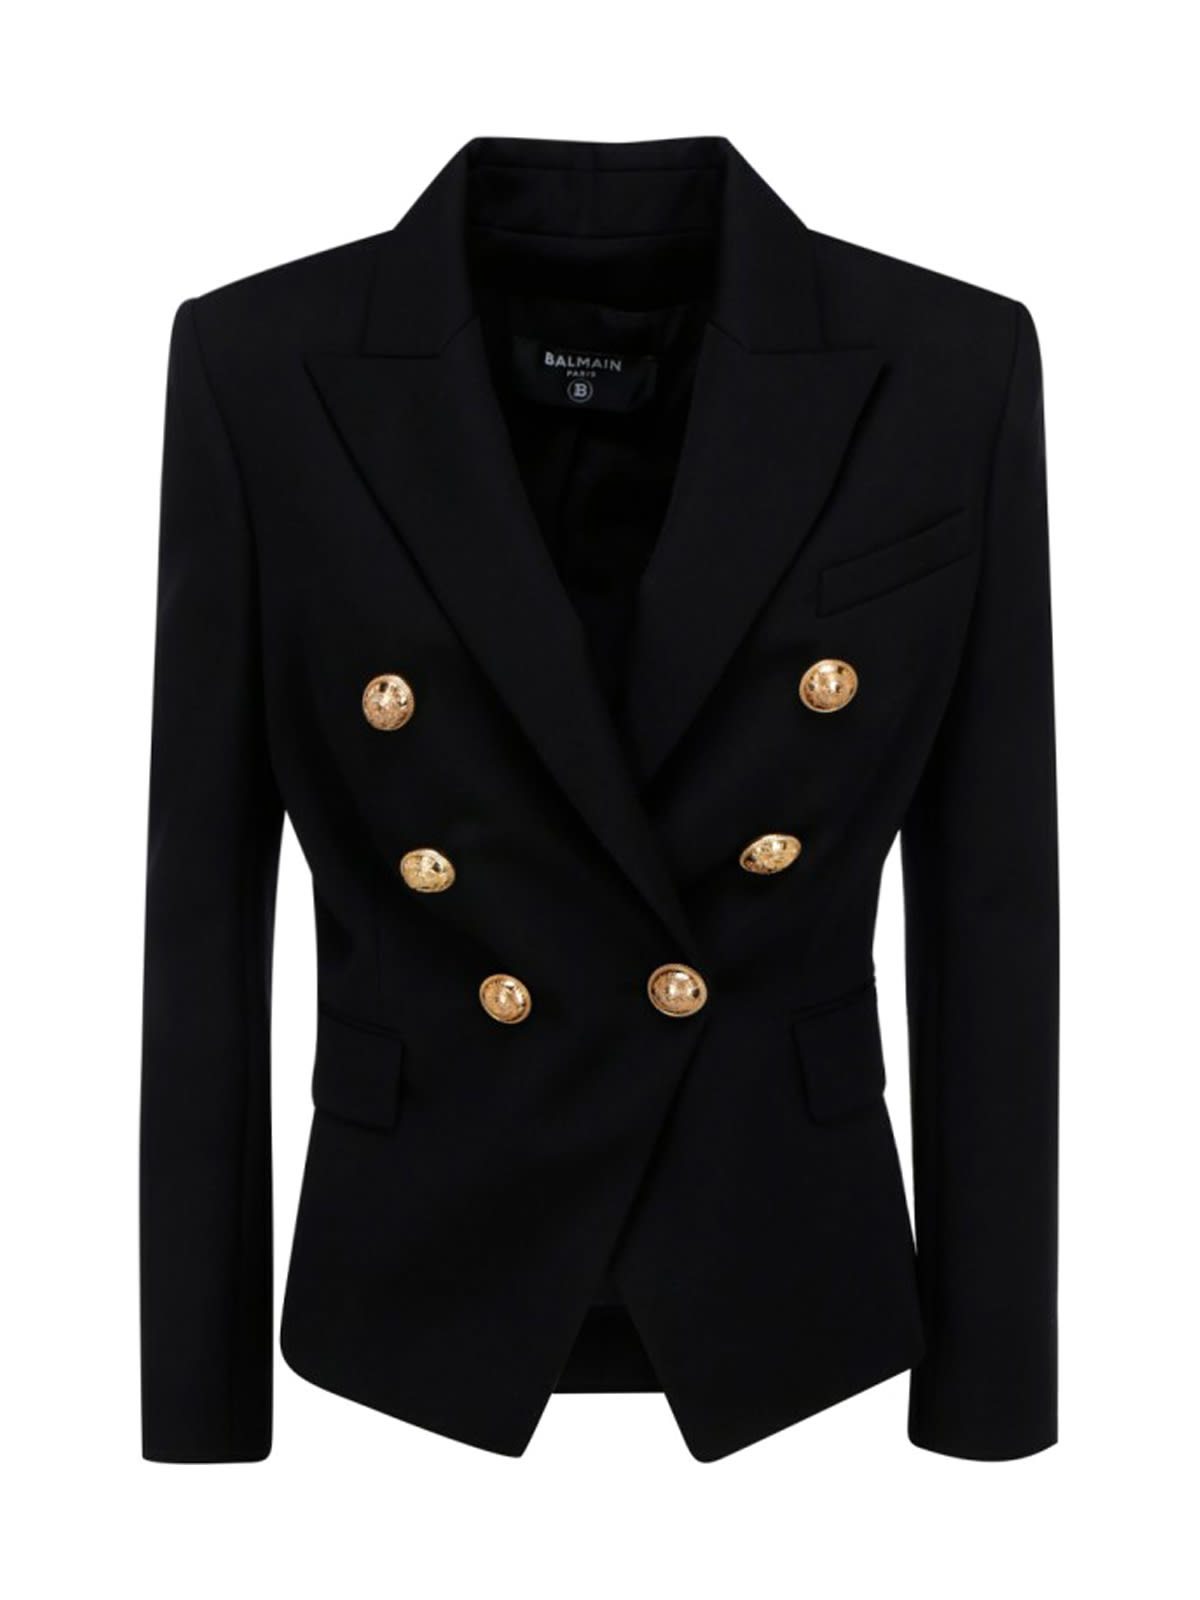 Balmain 6 Btn Grain De Poudre Jacket